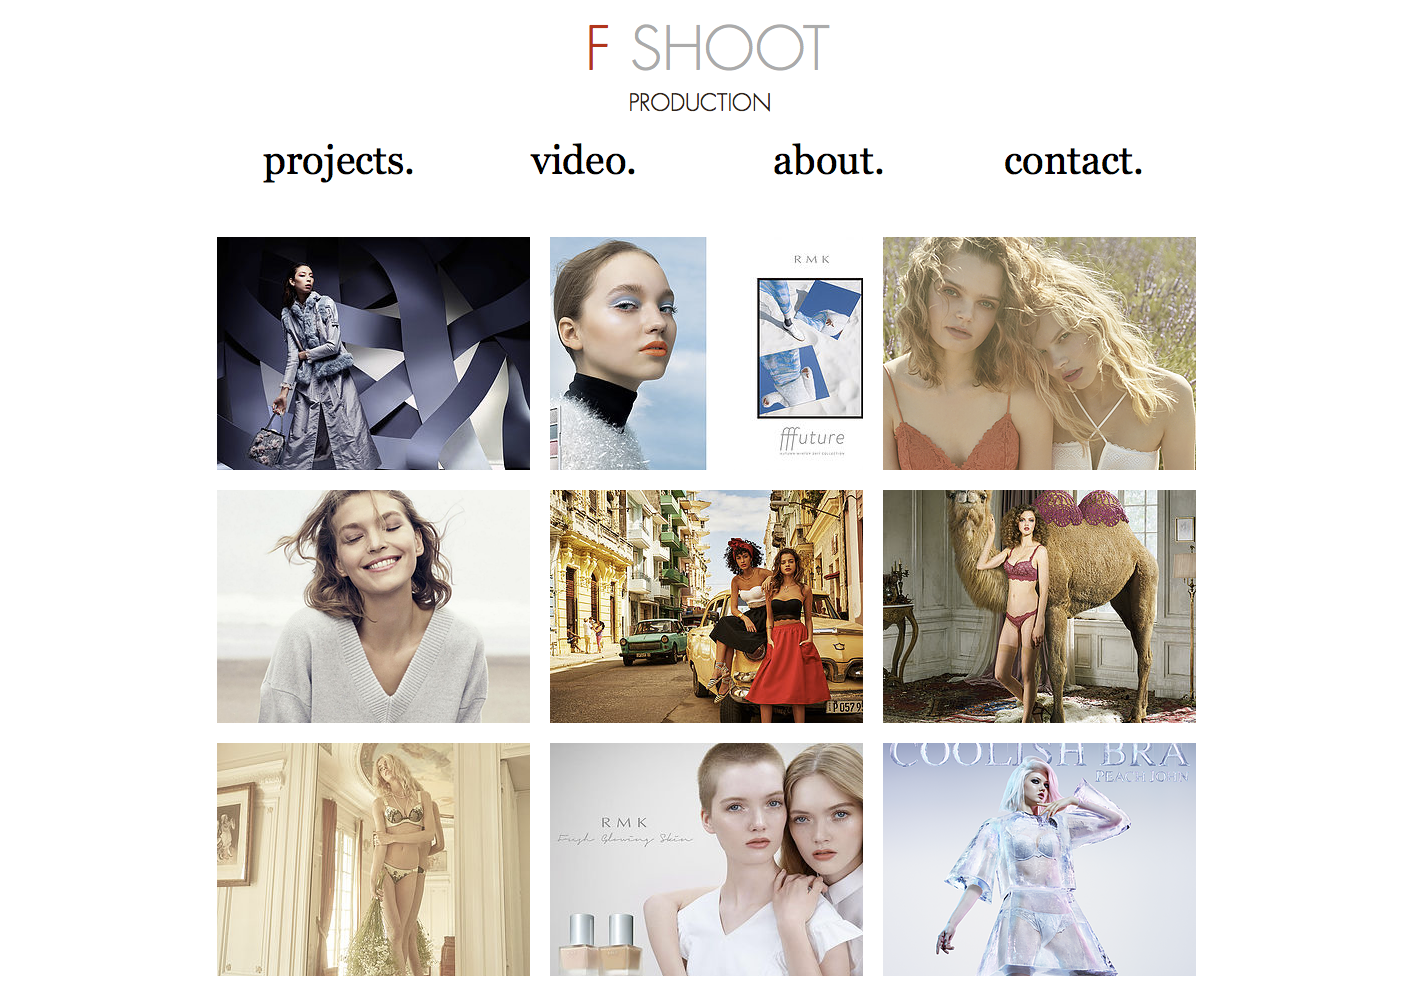 F Shoot new york - visit site